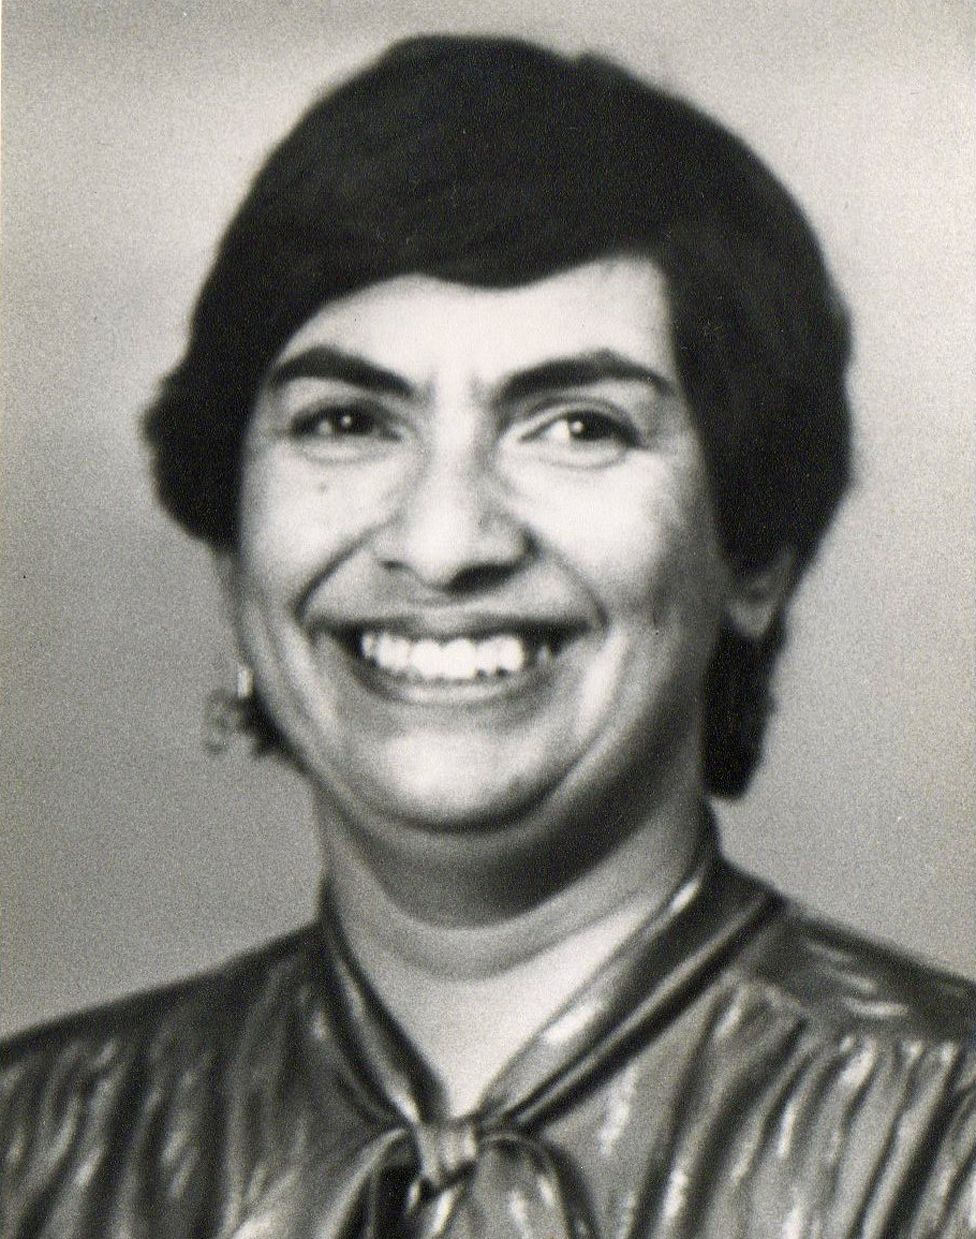 Nathan's mother, Margaret